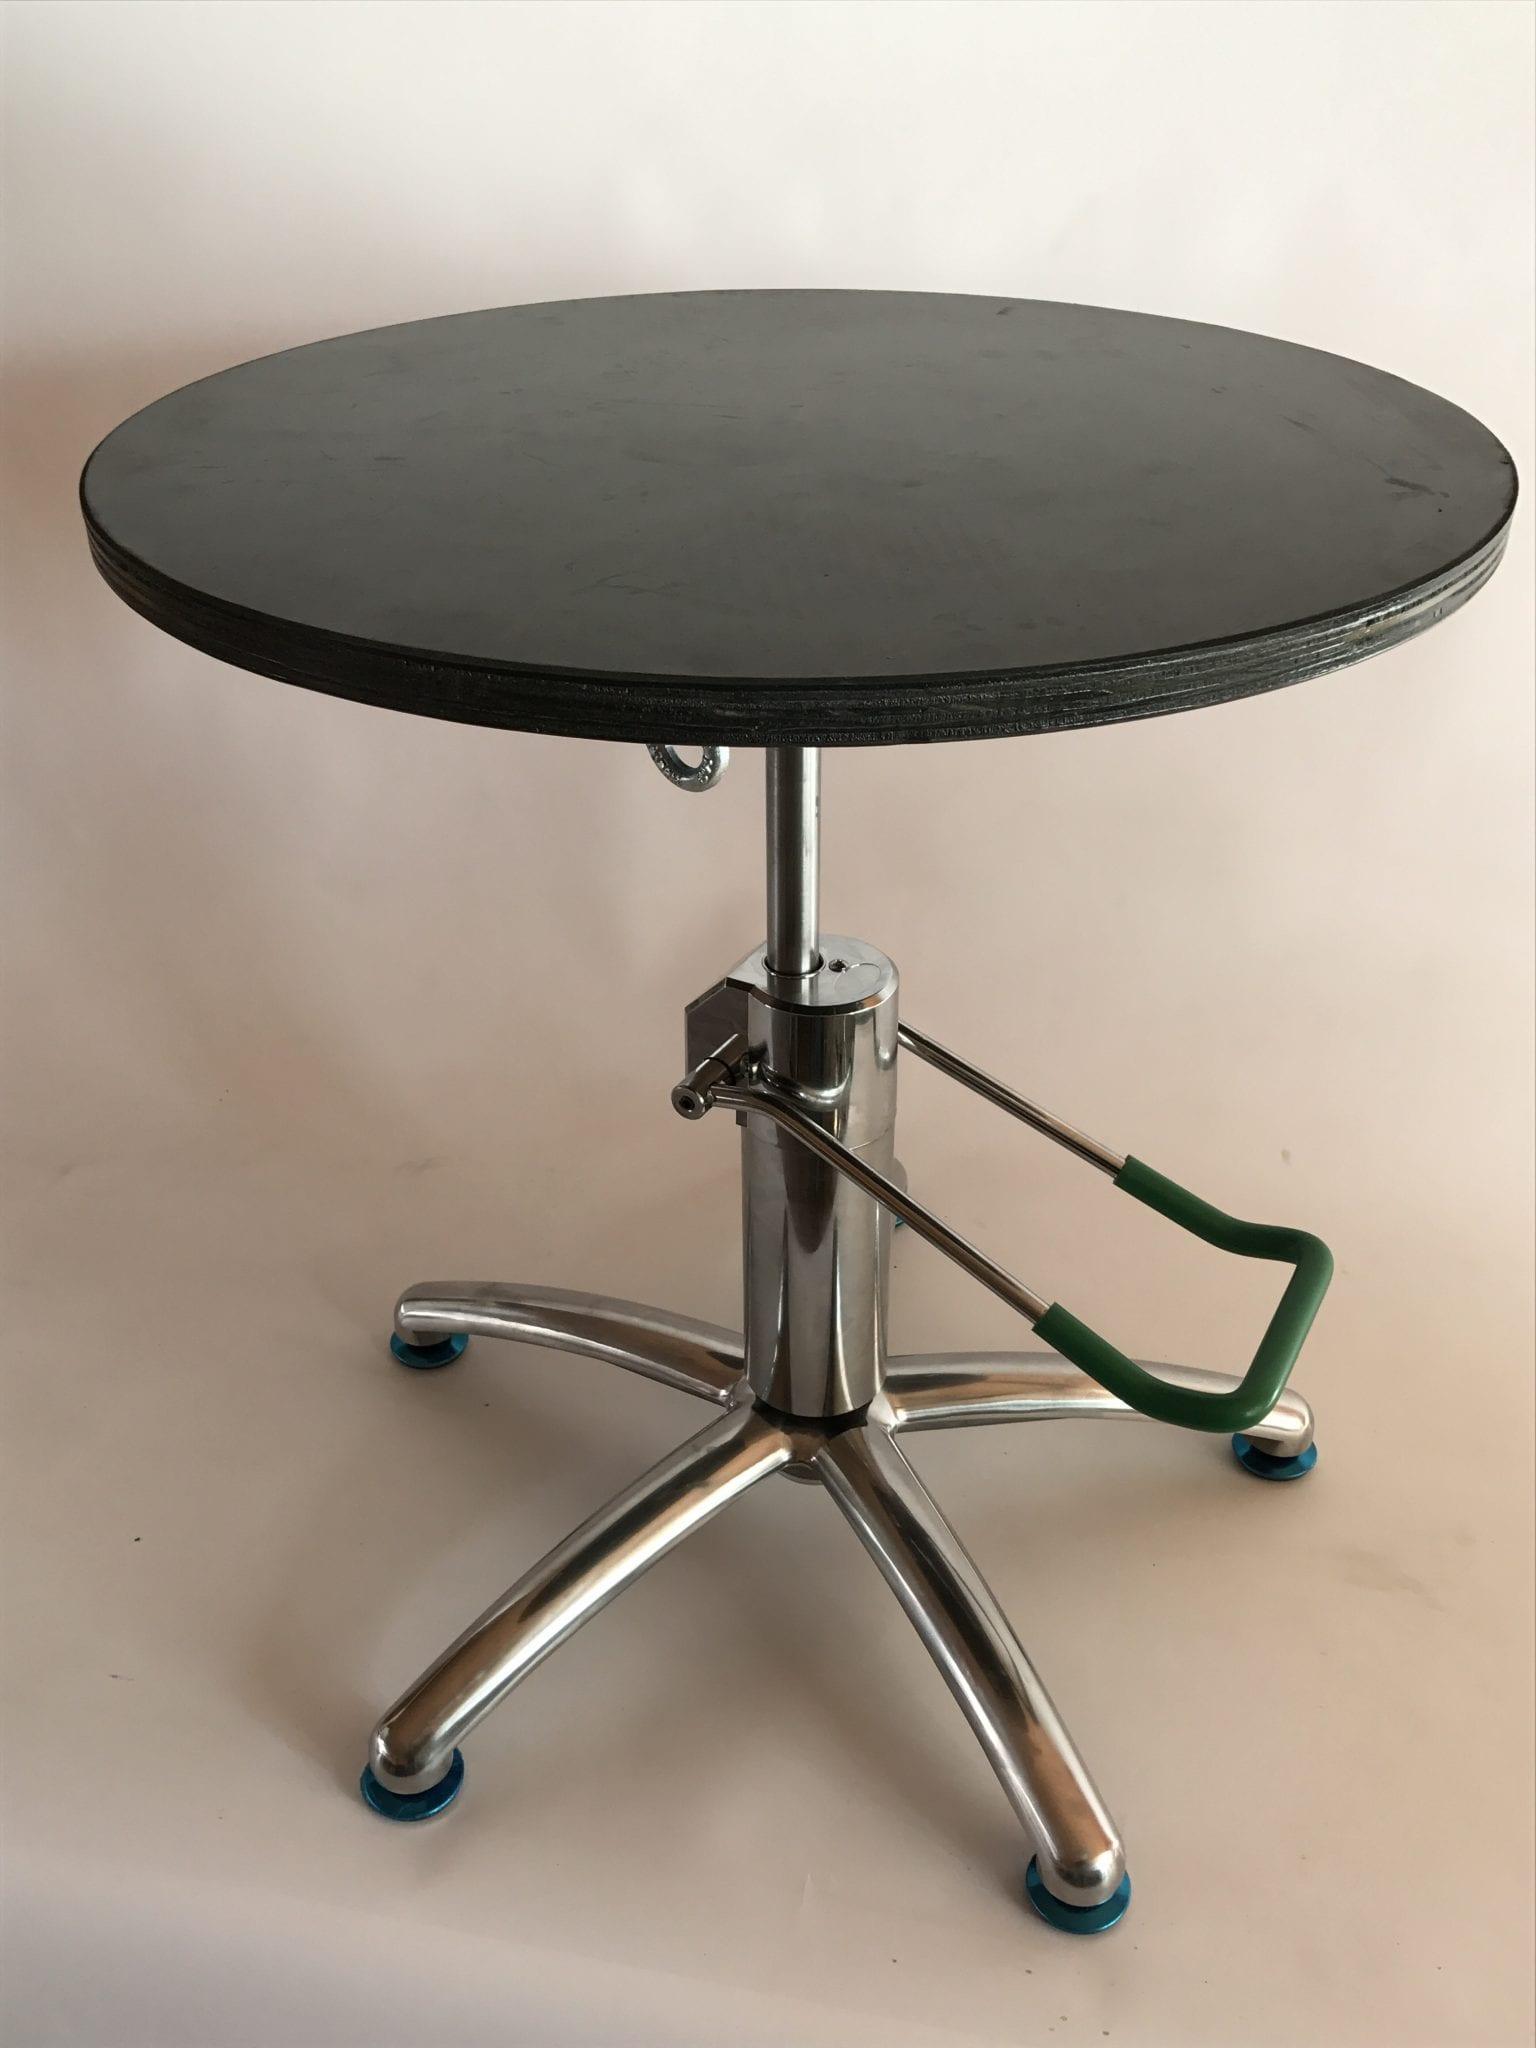 488564573 GreenT Basic   professional hydraulic lift bonsai turntable   Image of 488564573